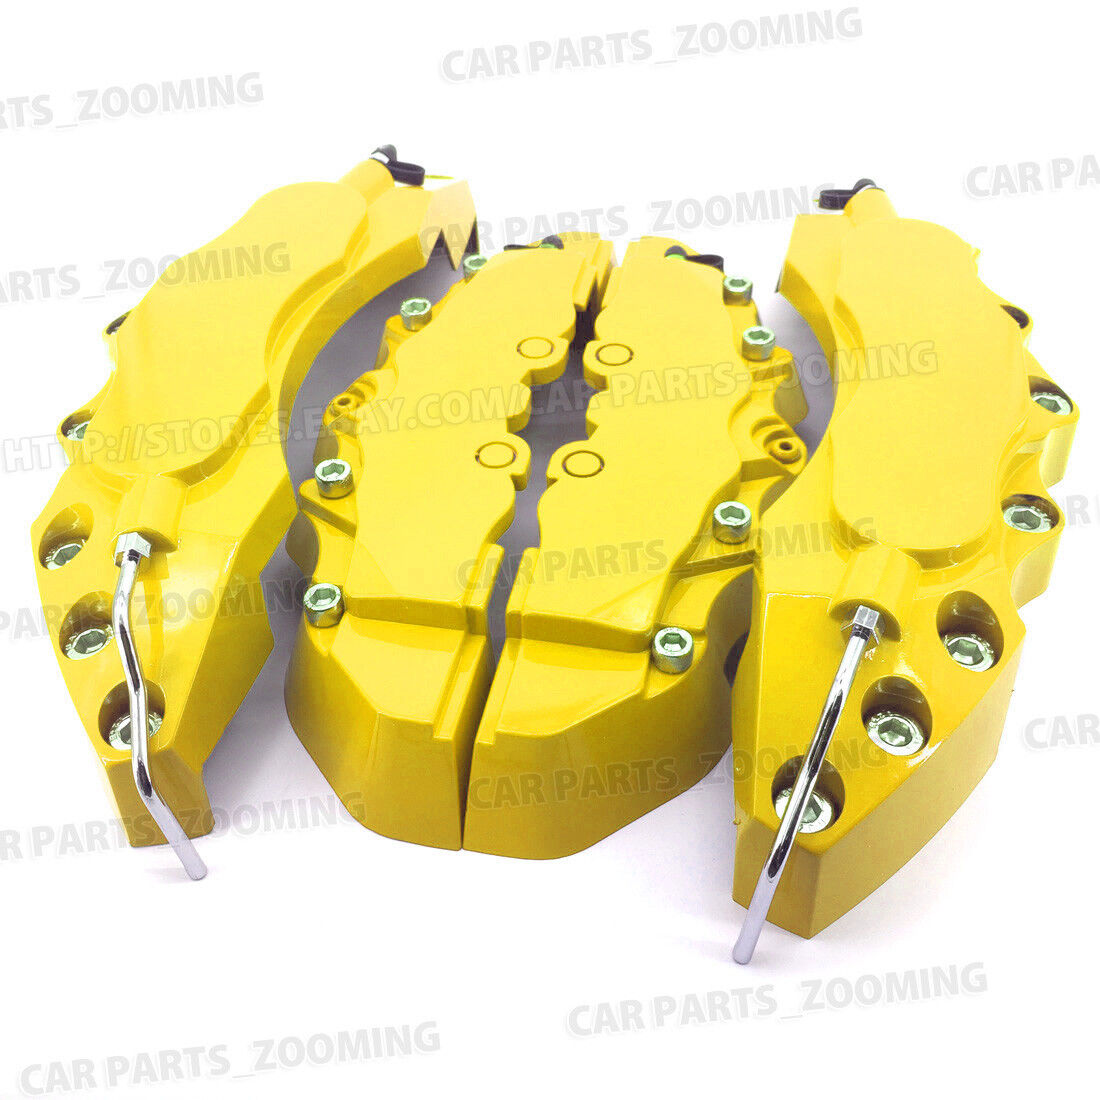 4x Yellow Style Brake Caliper Covers Universal Car Disc Front Rear Kits L+M LW02